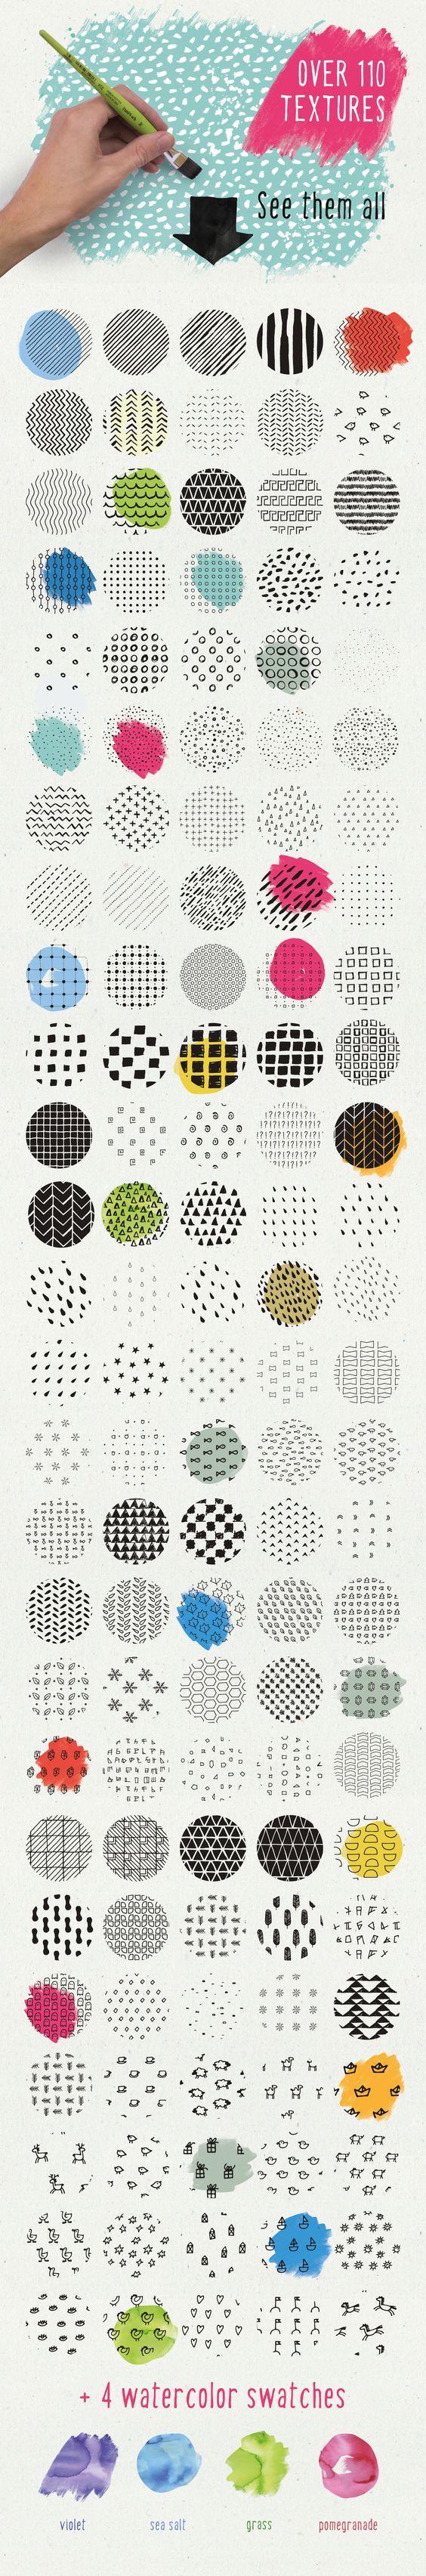 HandSketched Seamless Pattern Pack by Vítek Prchal on Creative Market